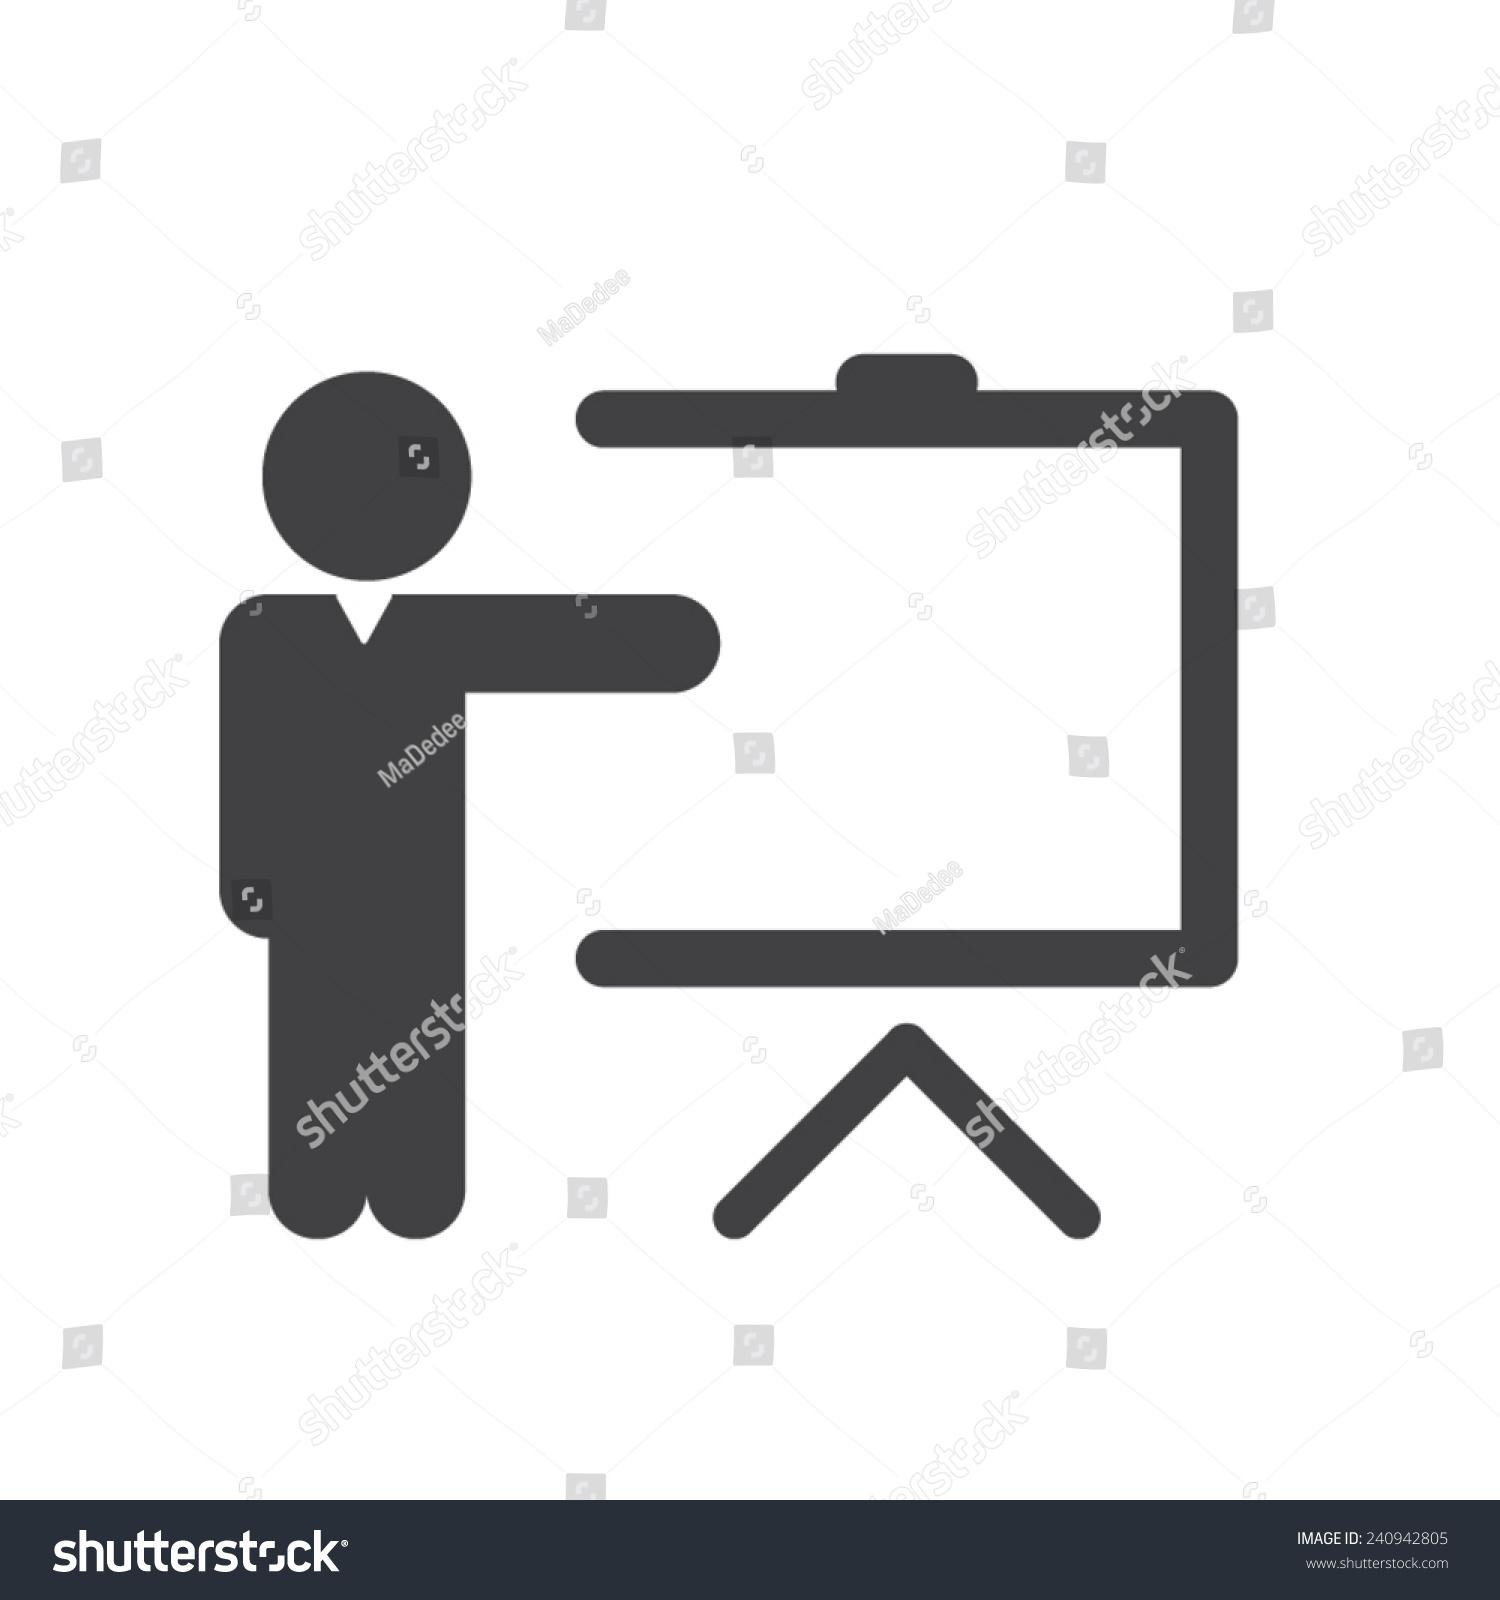 Training Icon Stock Vector 240942805 - Shutterstock